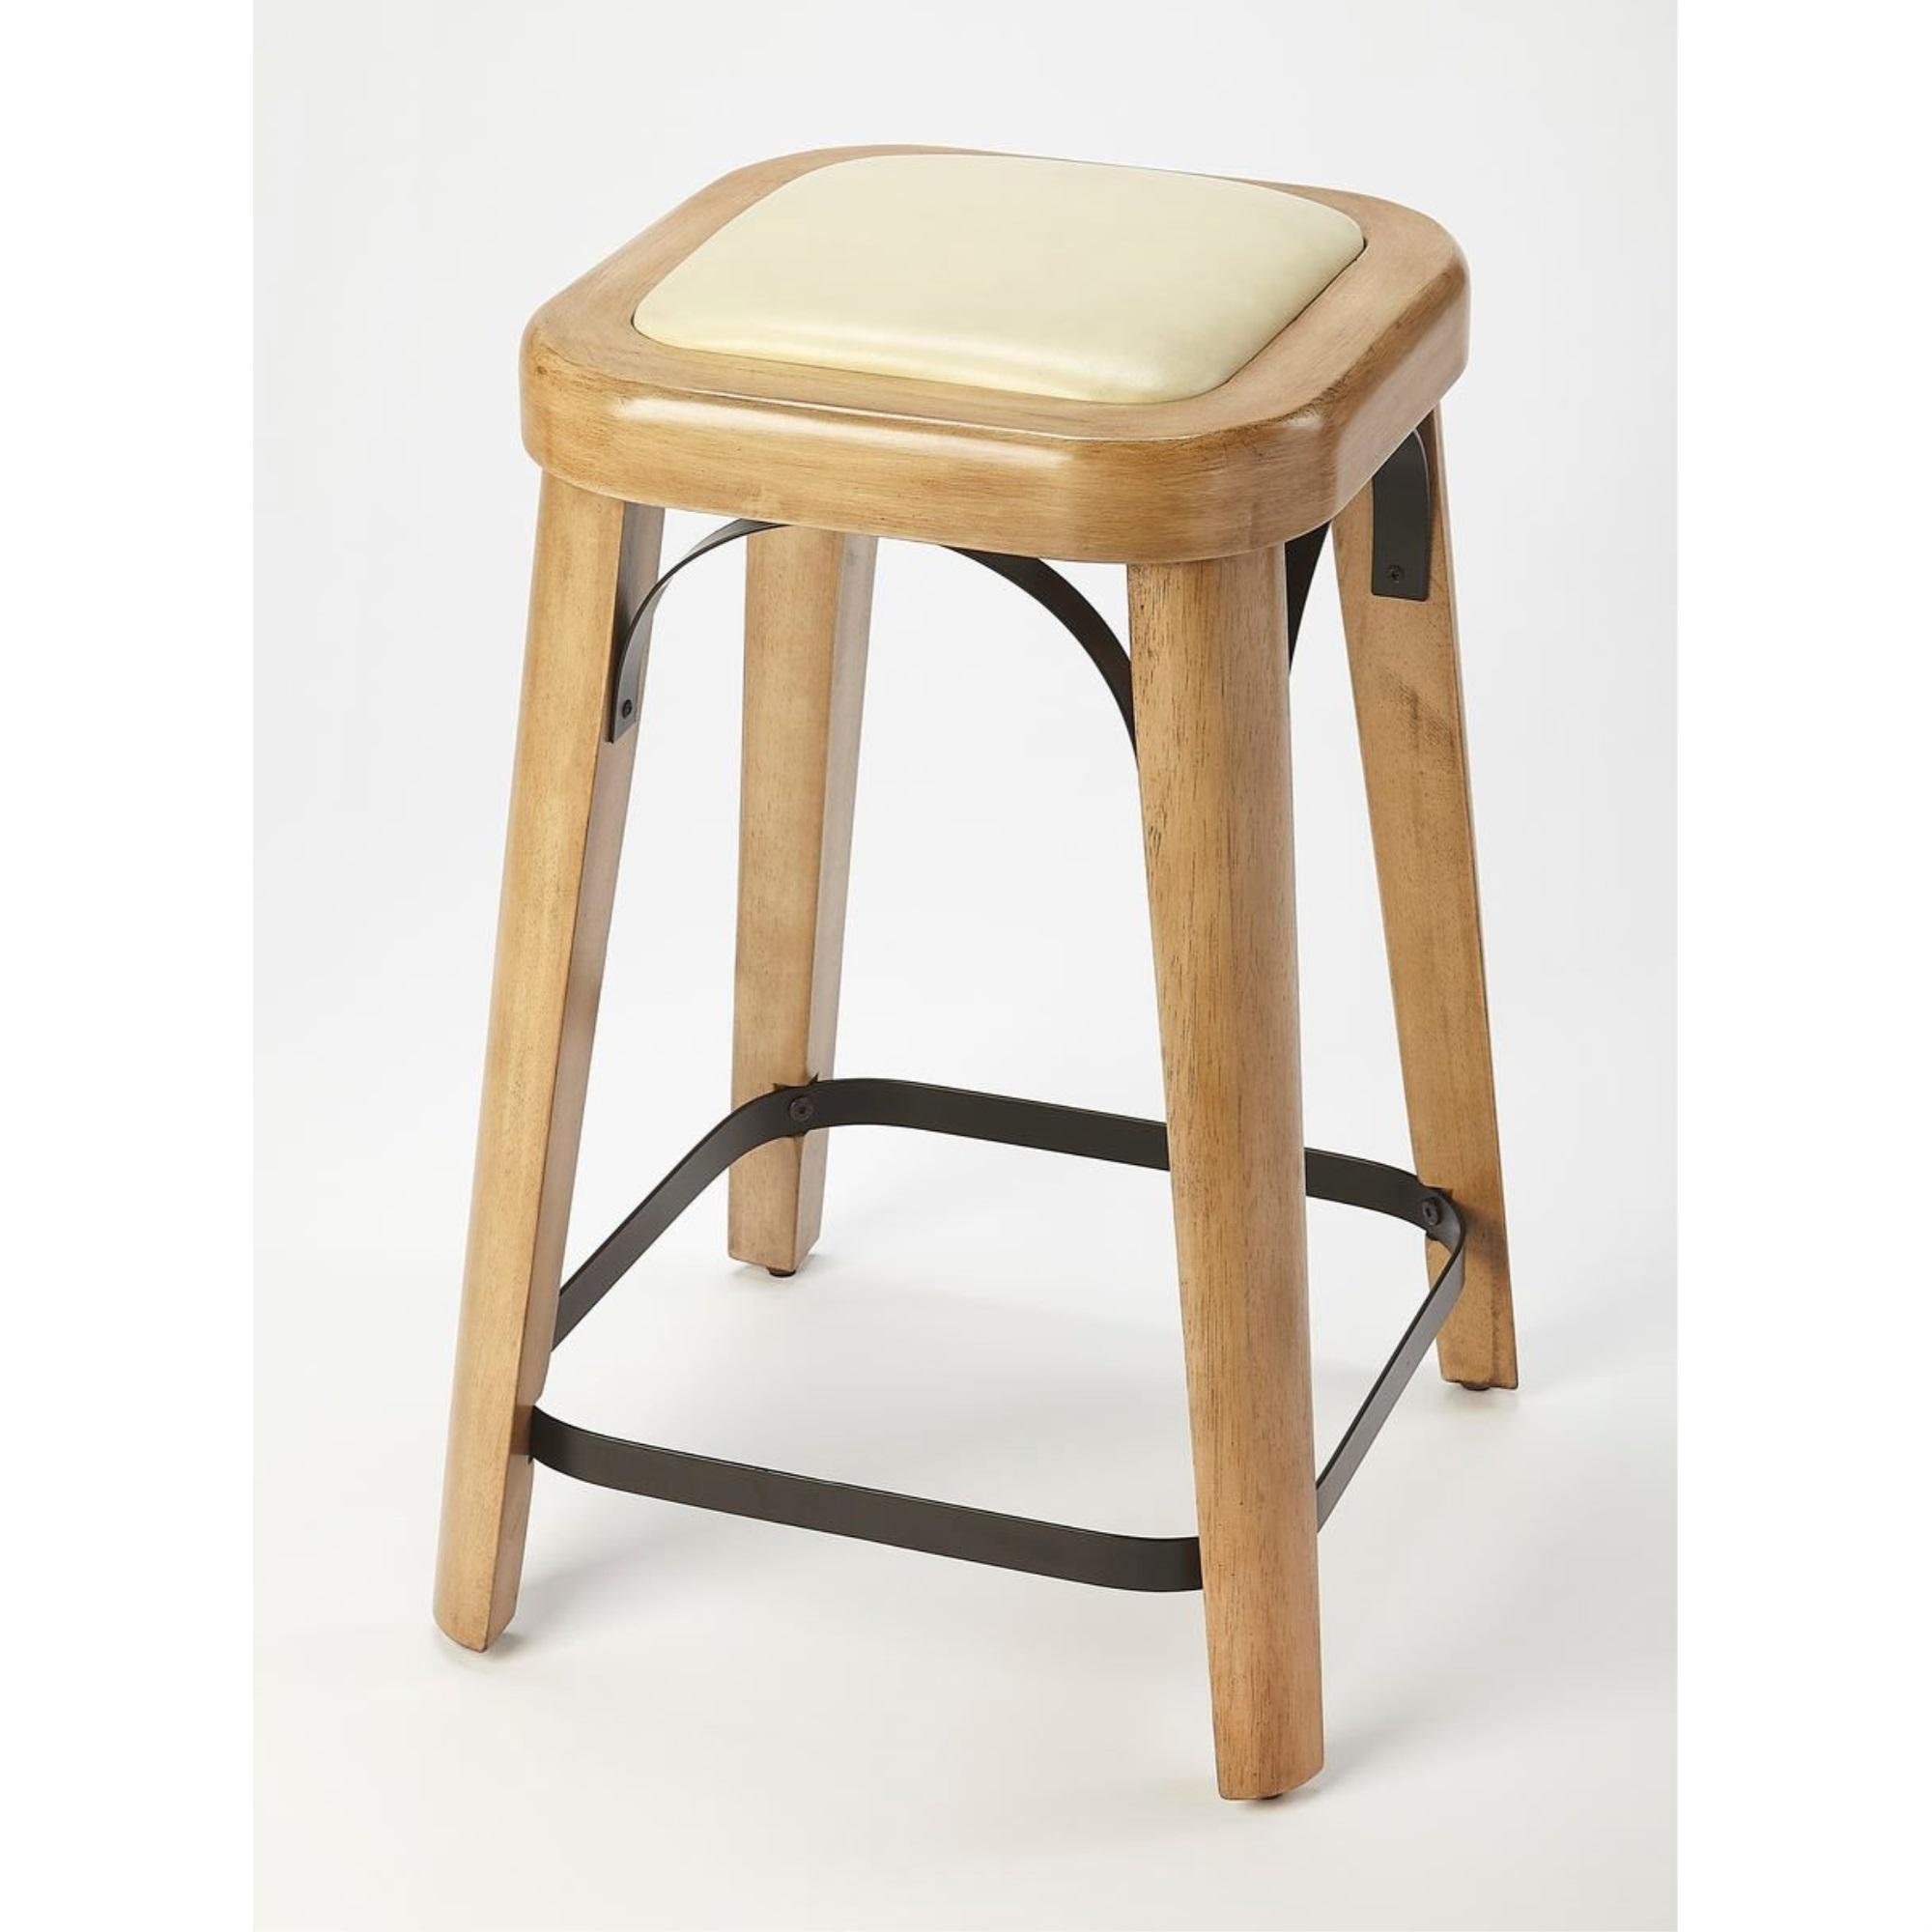 Fine Details About Butler Fermi Sandy Shore Counter Stool Machost Co Dining Chair Design Ideas Machostcouk